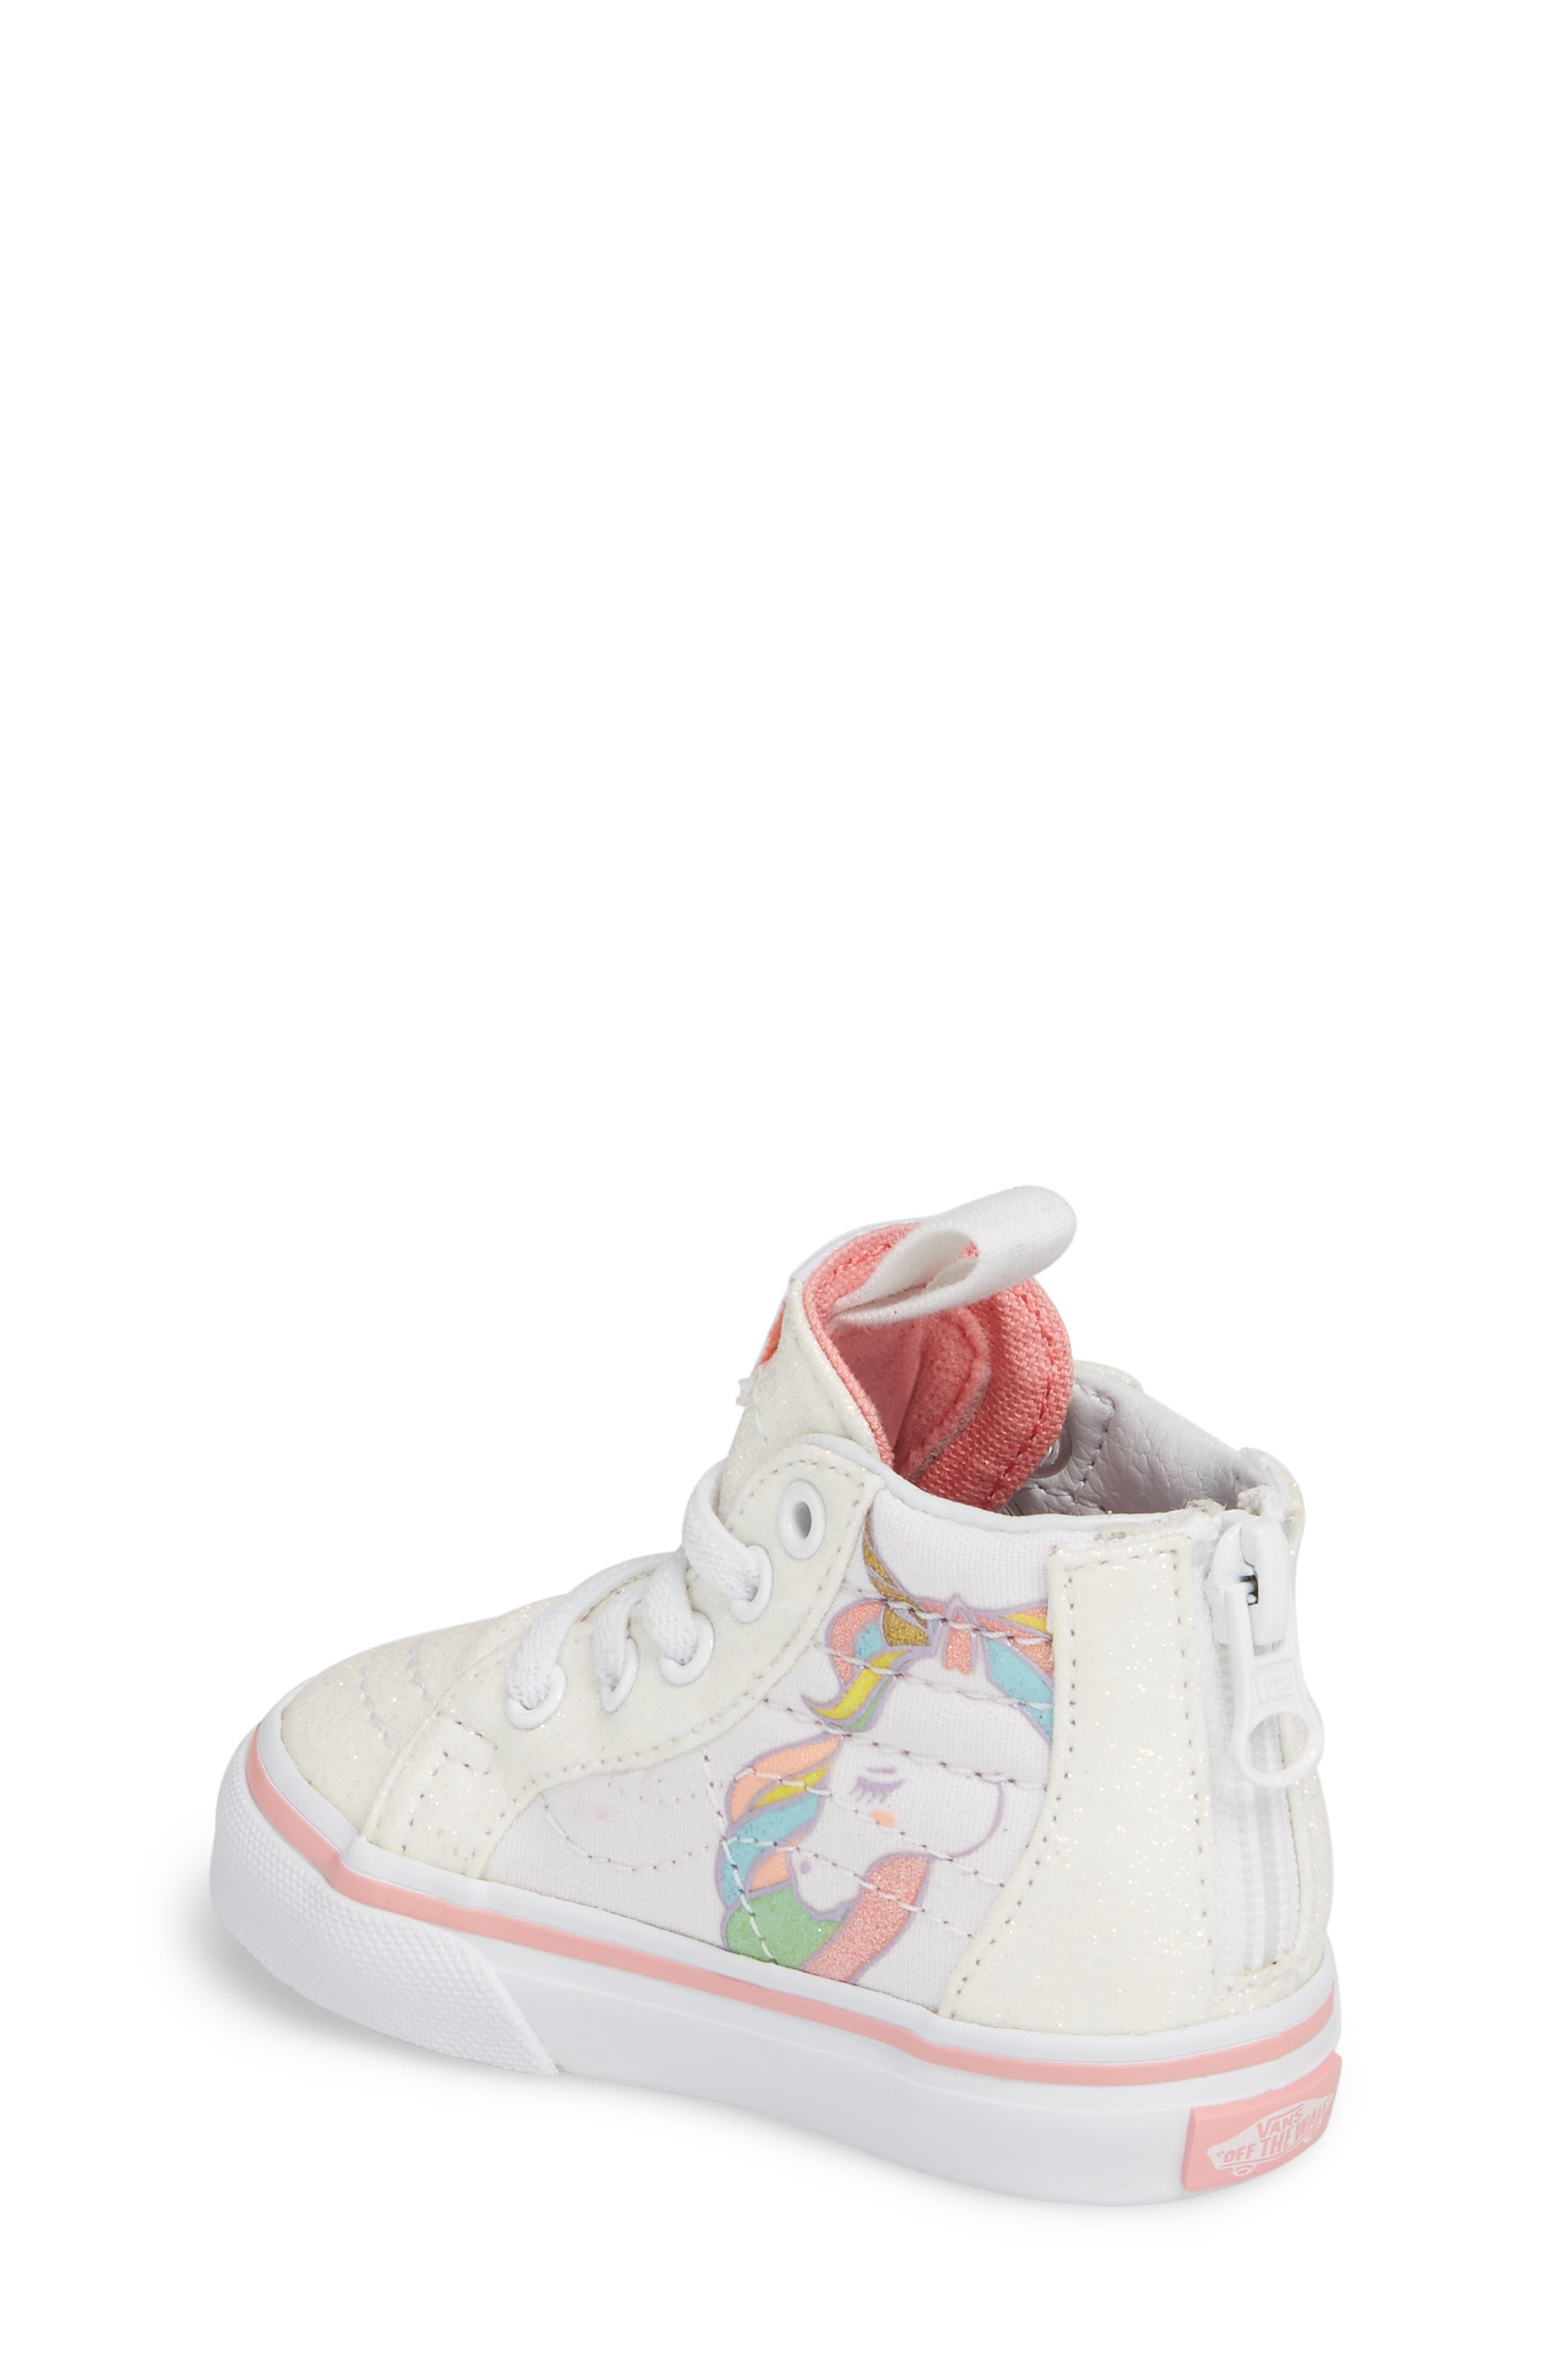 Alternate Image 2  - Vans SK8-Hi Zip Glitter Unicorn Sneaker (Baby, Walker & Toddler)